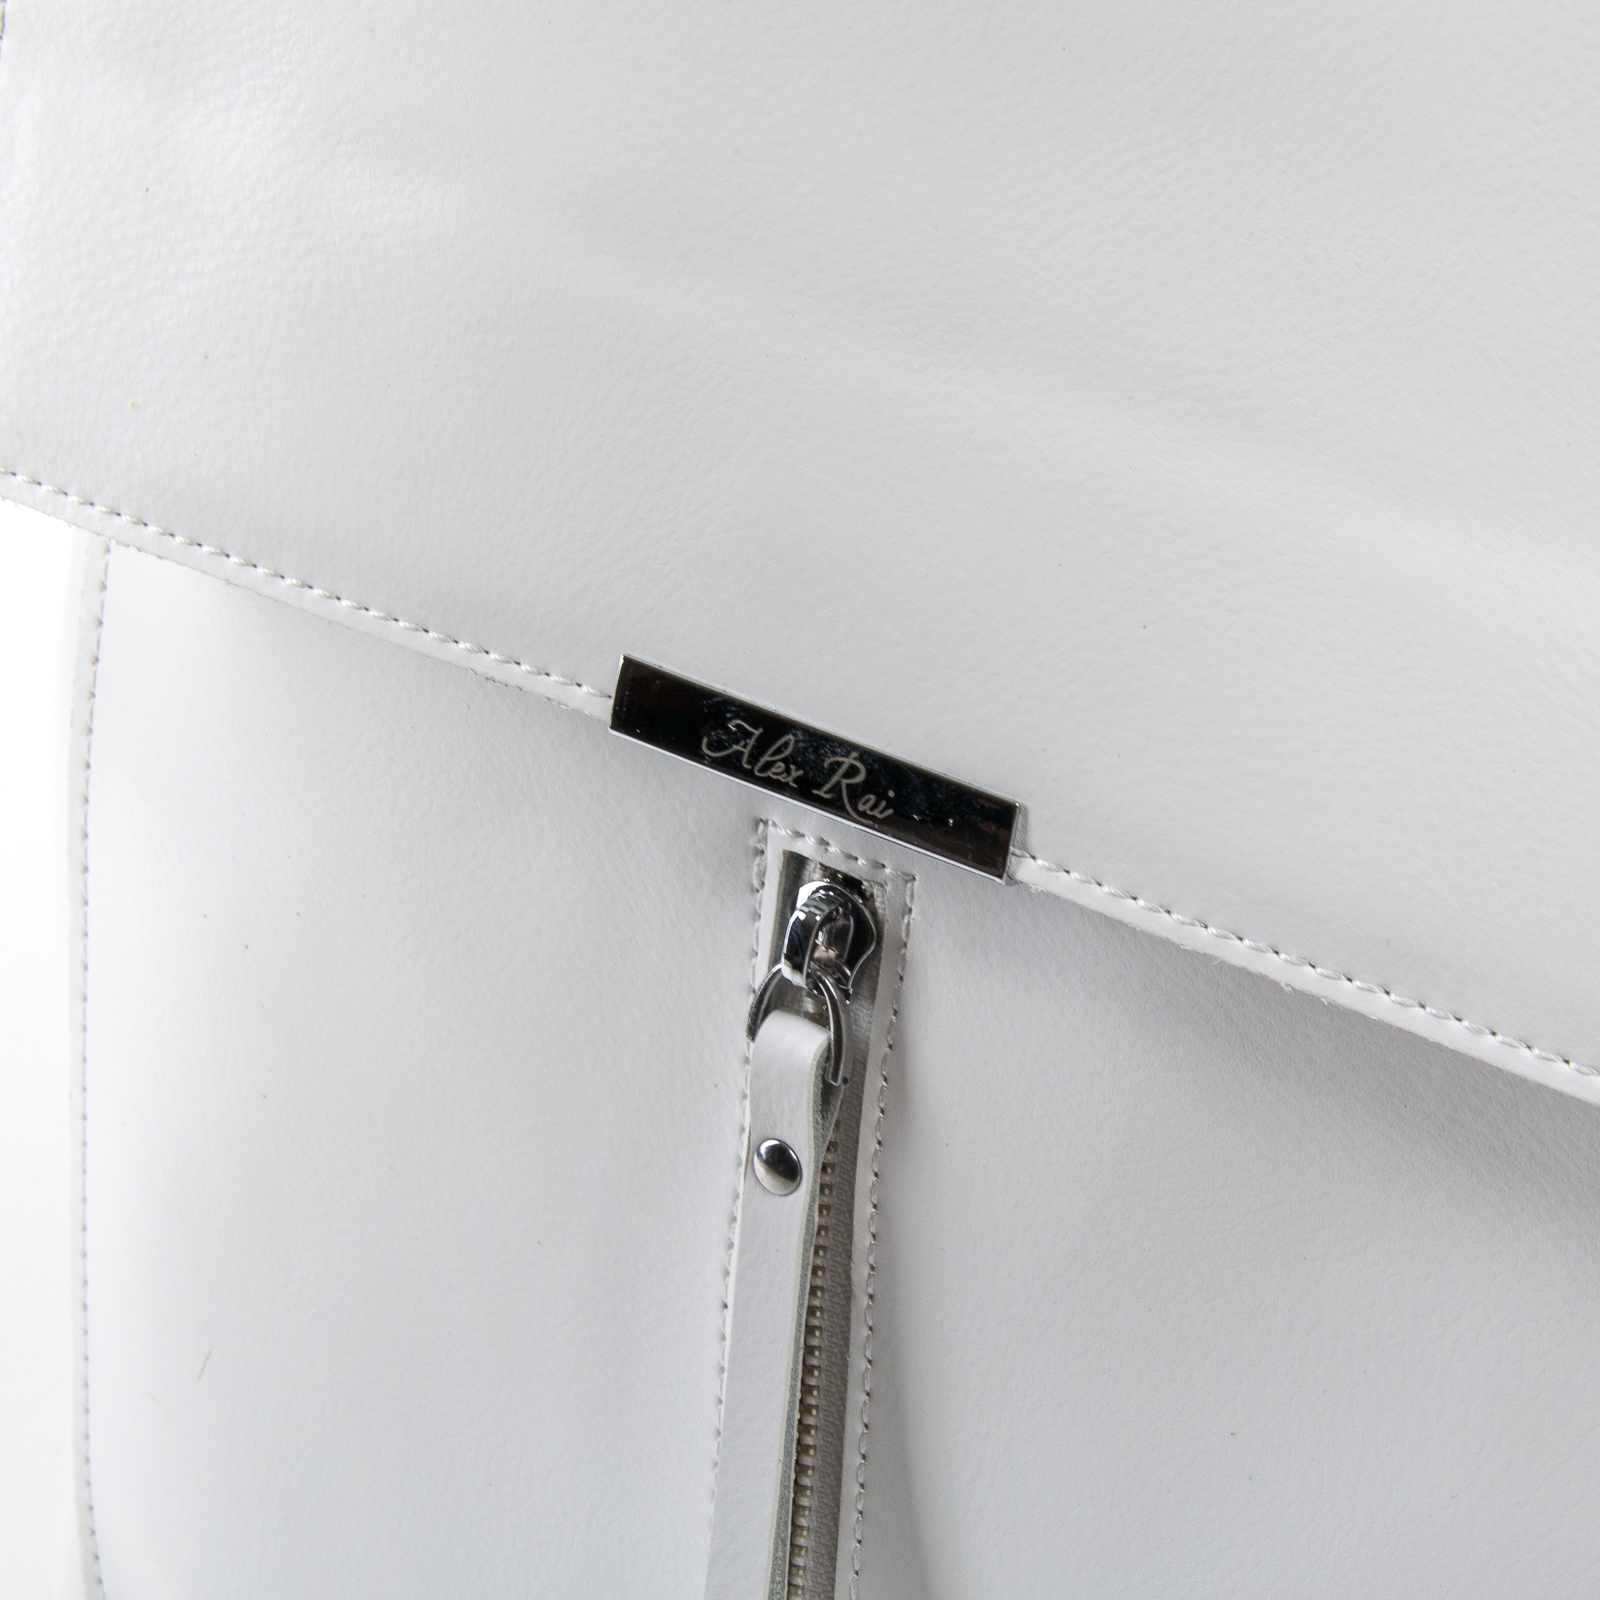 Сумка Женская Рюкзак кожа ALEX RAI 03-01 373 white - фото 3